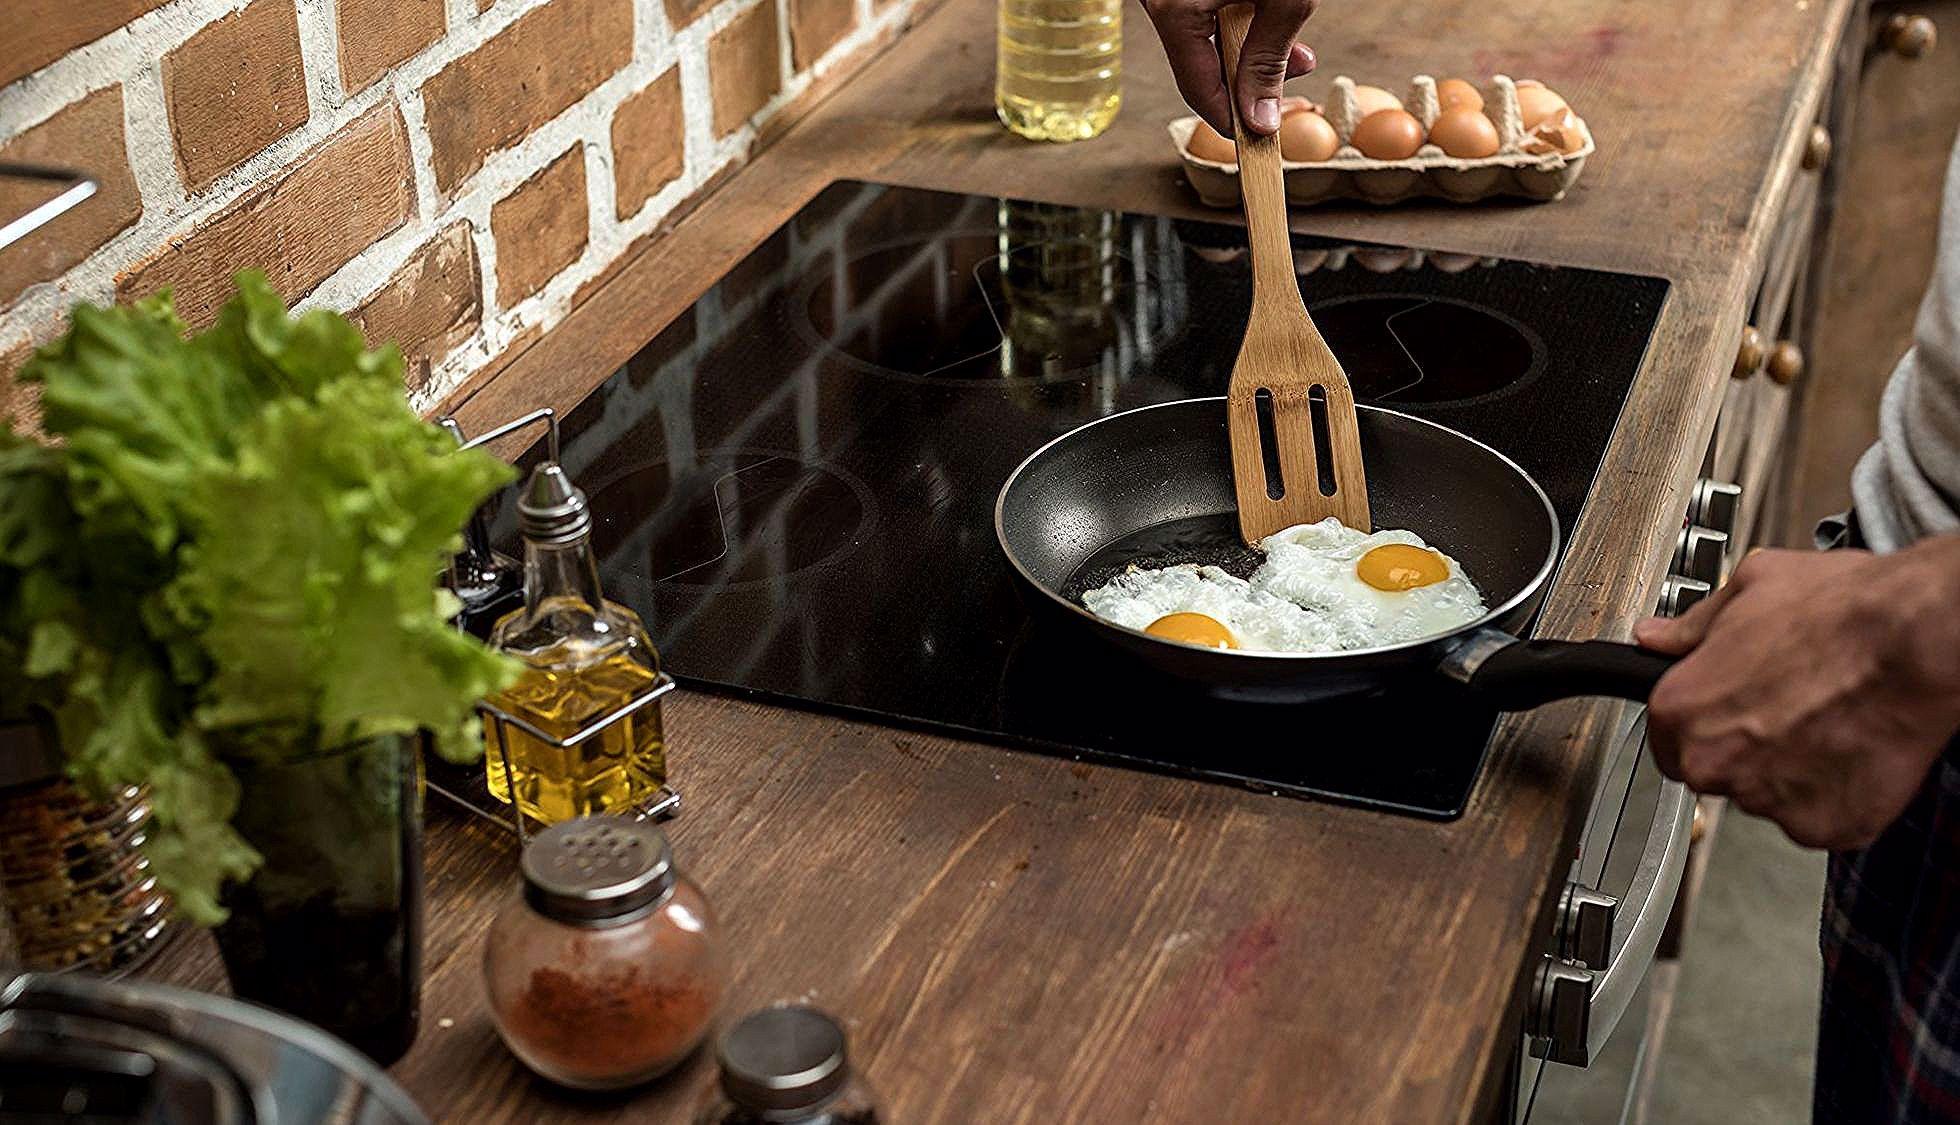 Comment Nettoyer Ma Plaque Induction comment nettoyer une plaque à induction ? | food preparation